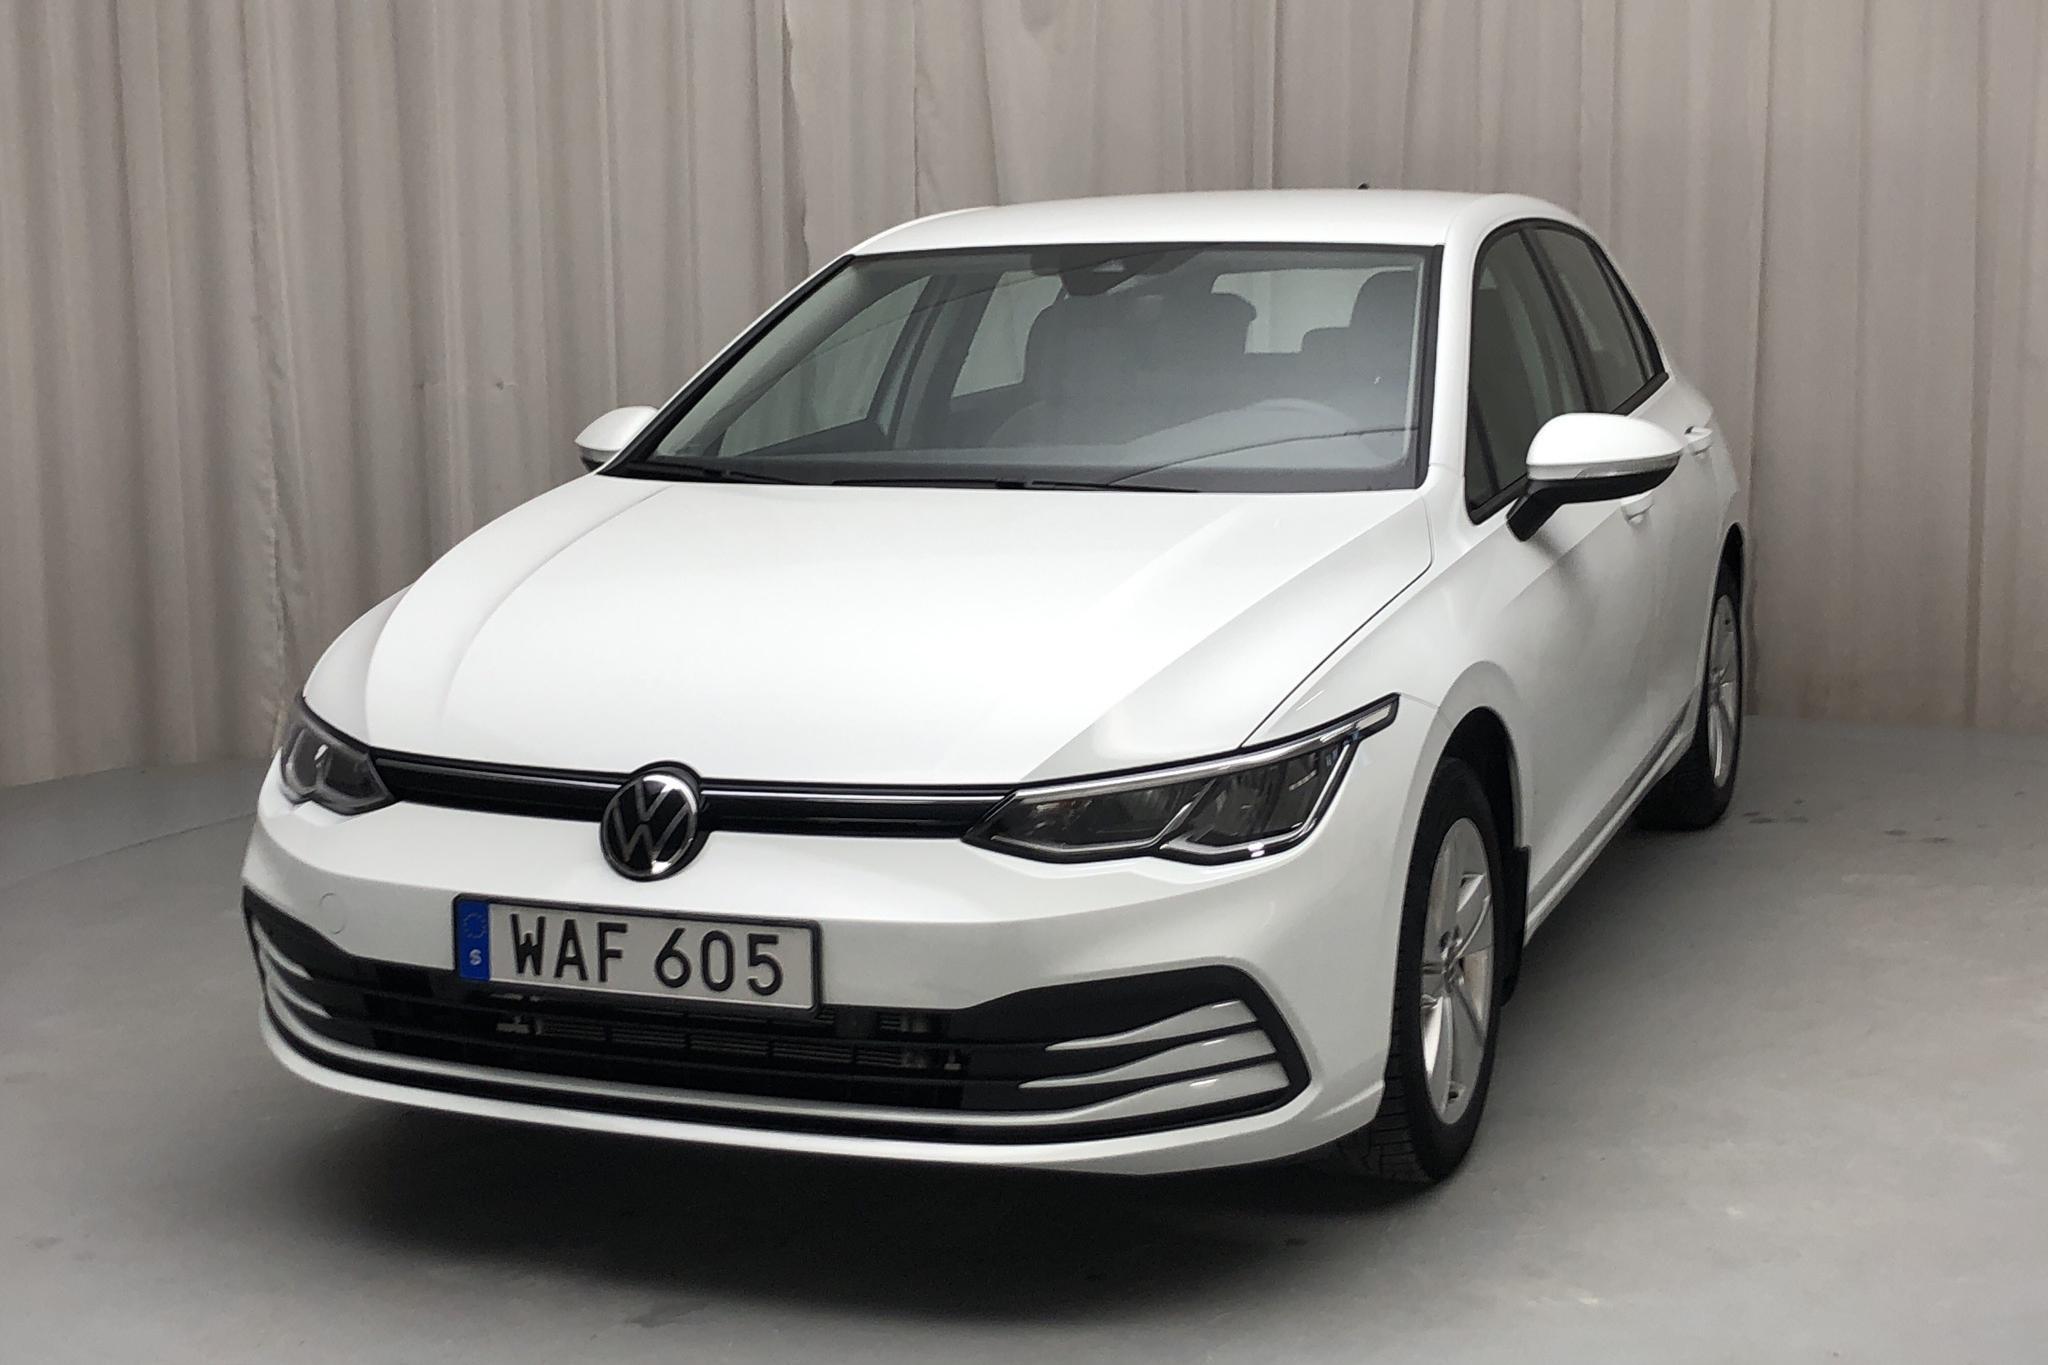 VW Golf VIII 1.0 TSI 5dr (110hk)